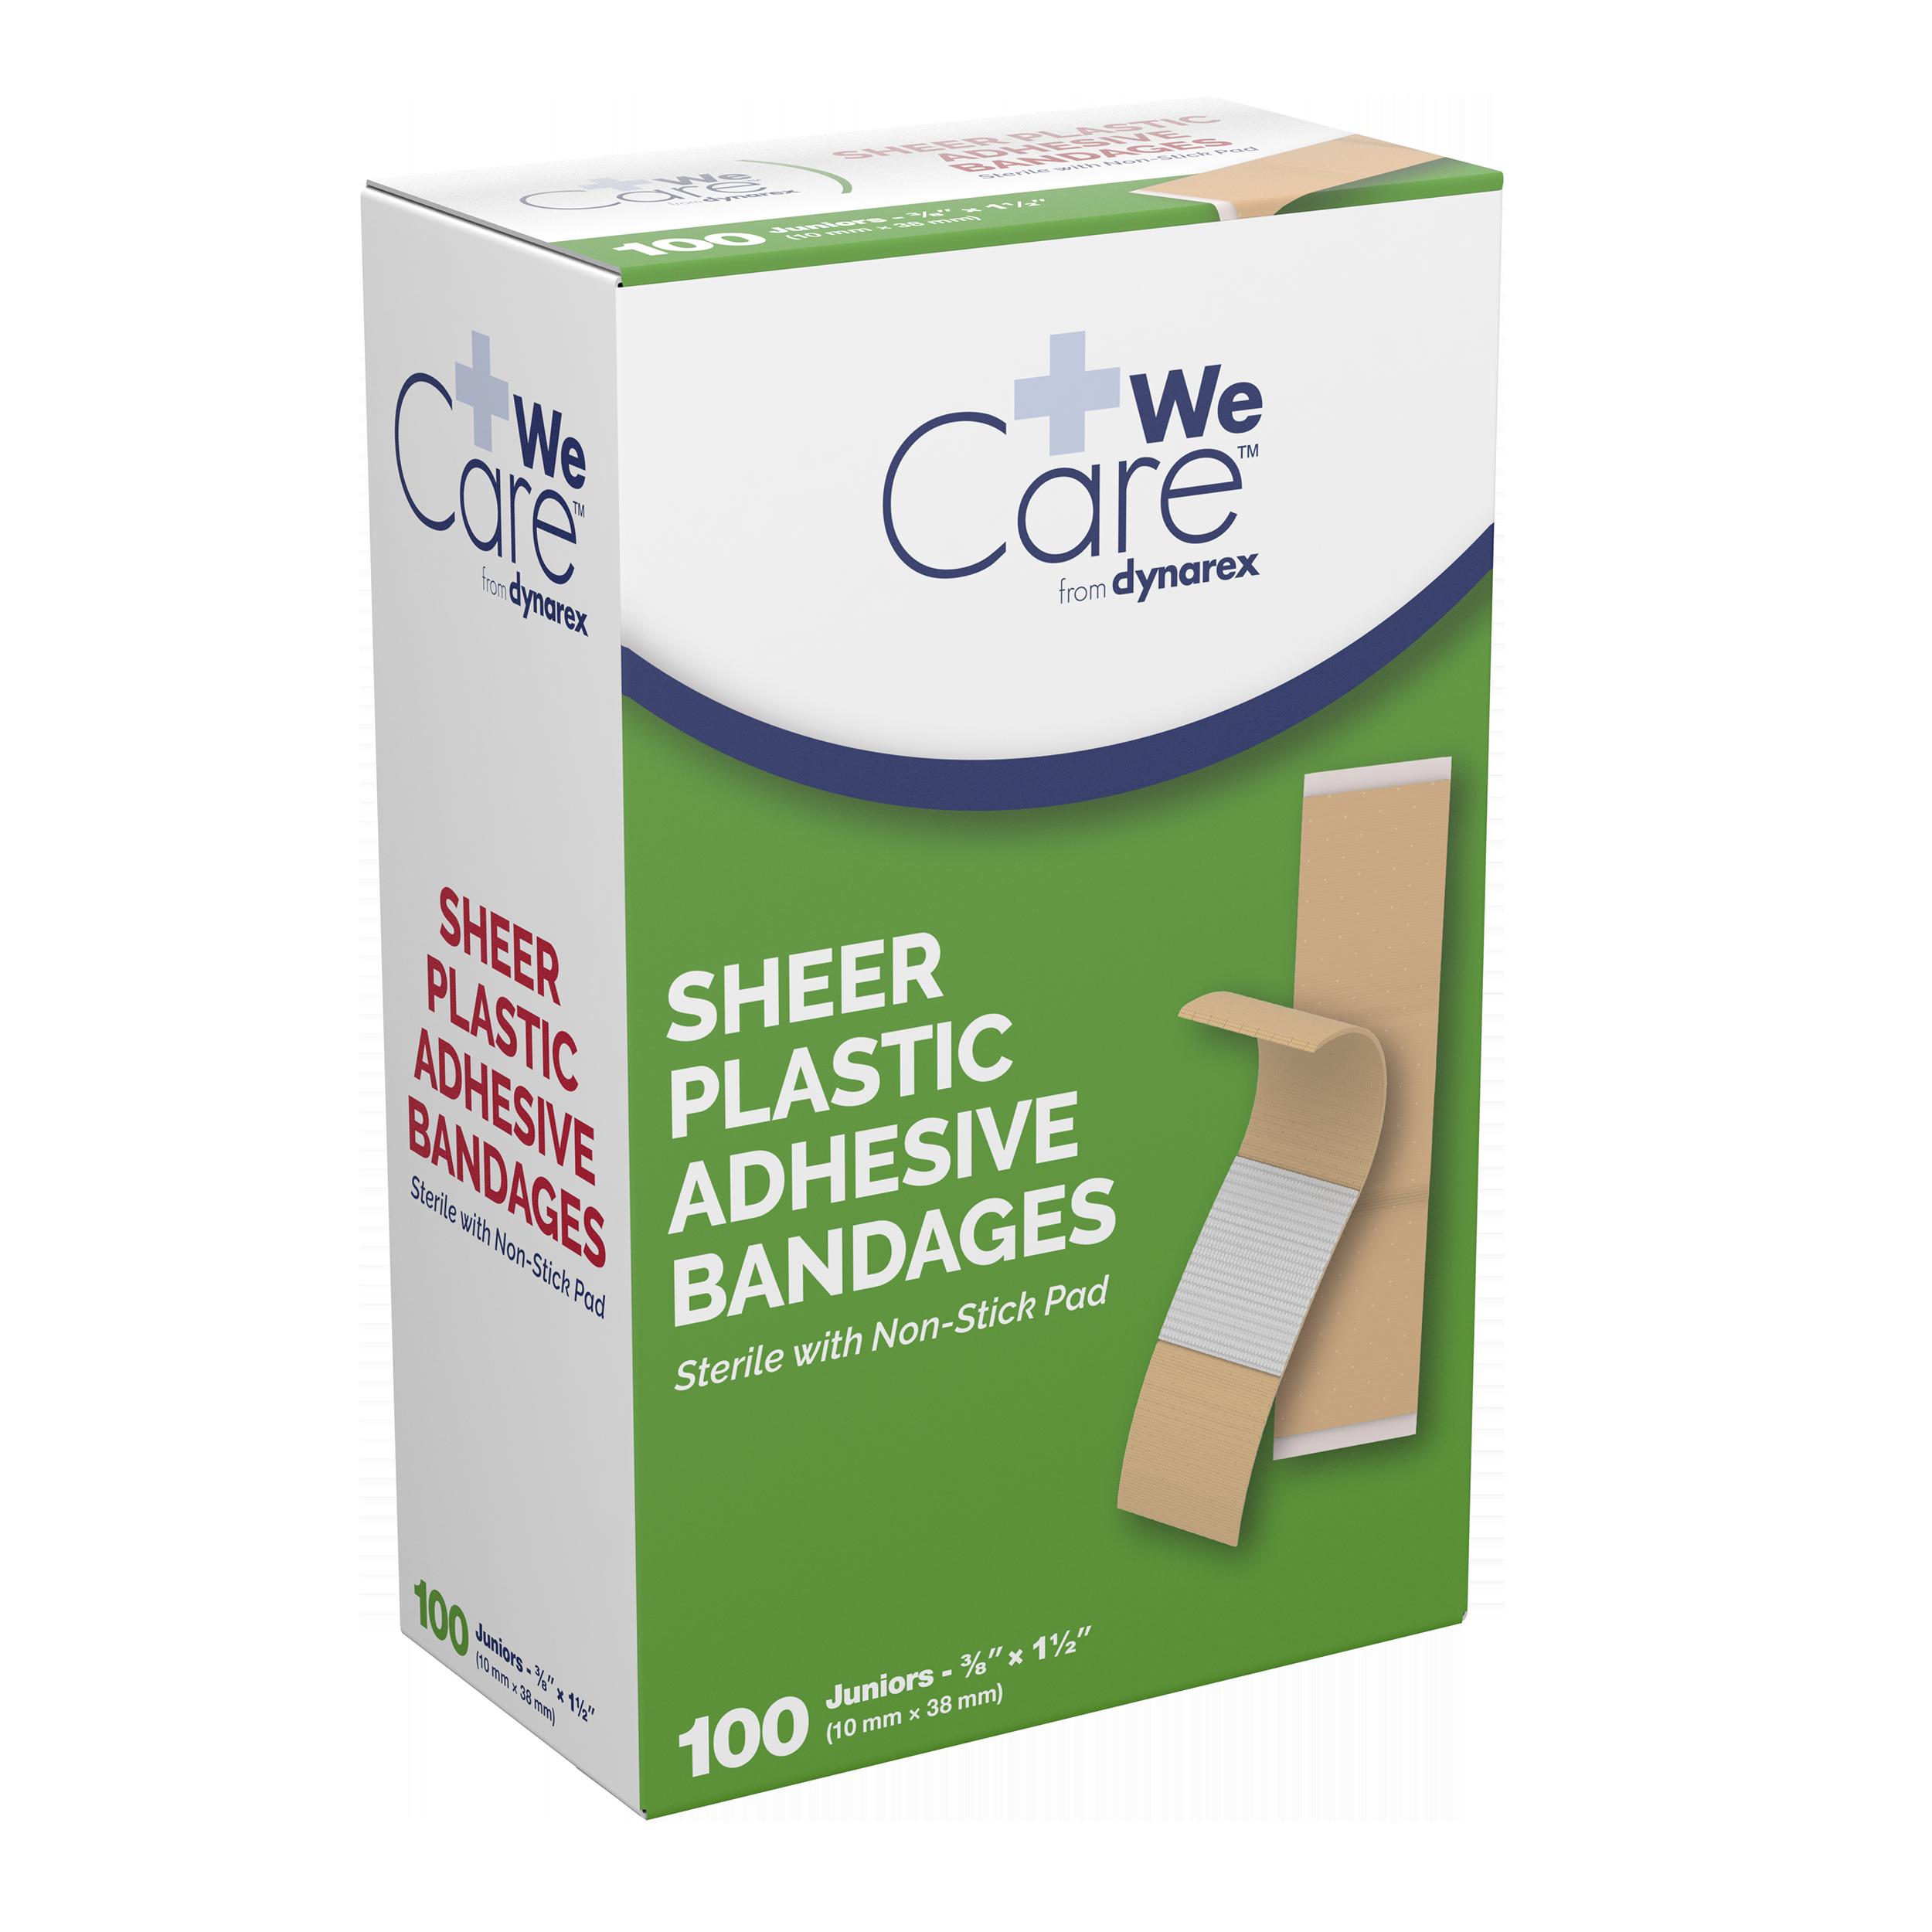 Sheer Plastic Adhesive Bandages Sterile - 3/8